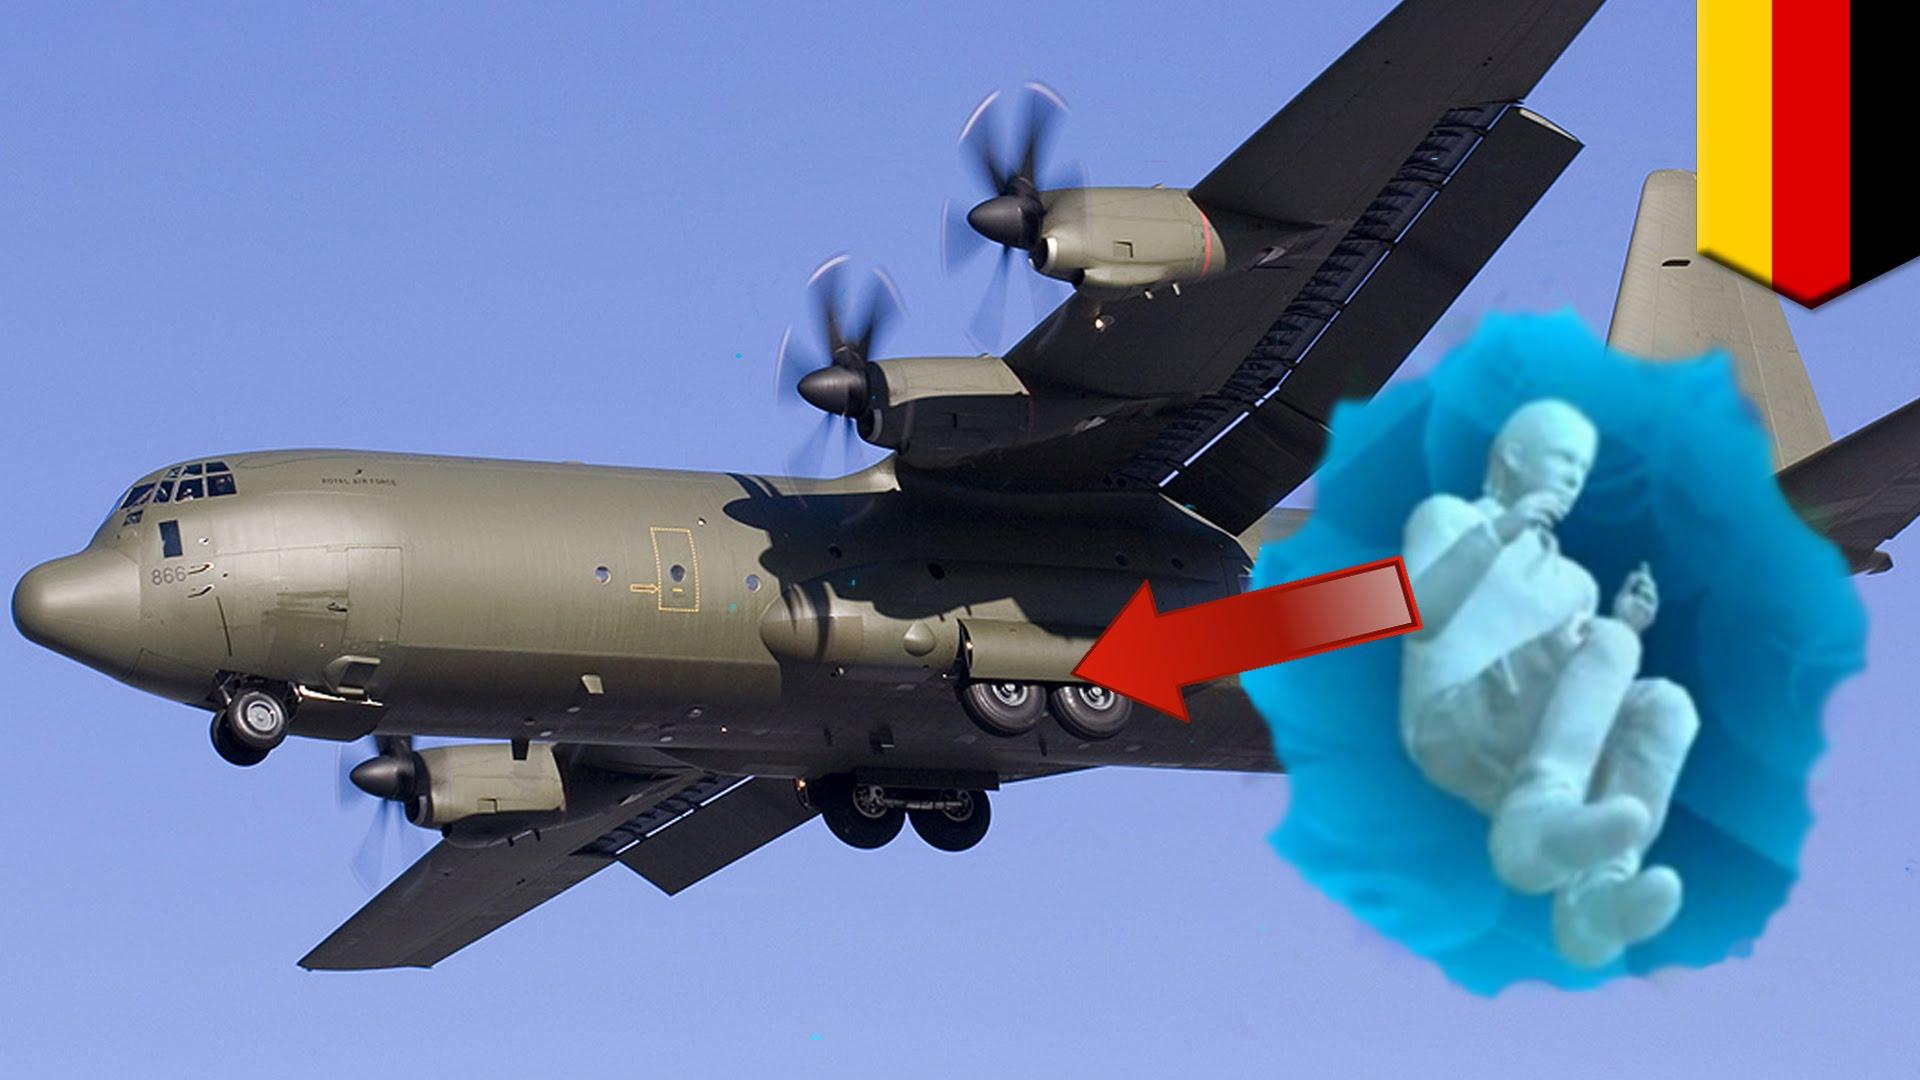 Drawn airplane cargo plane #12